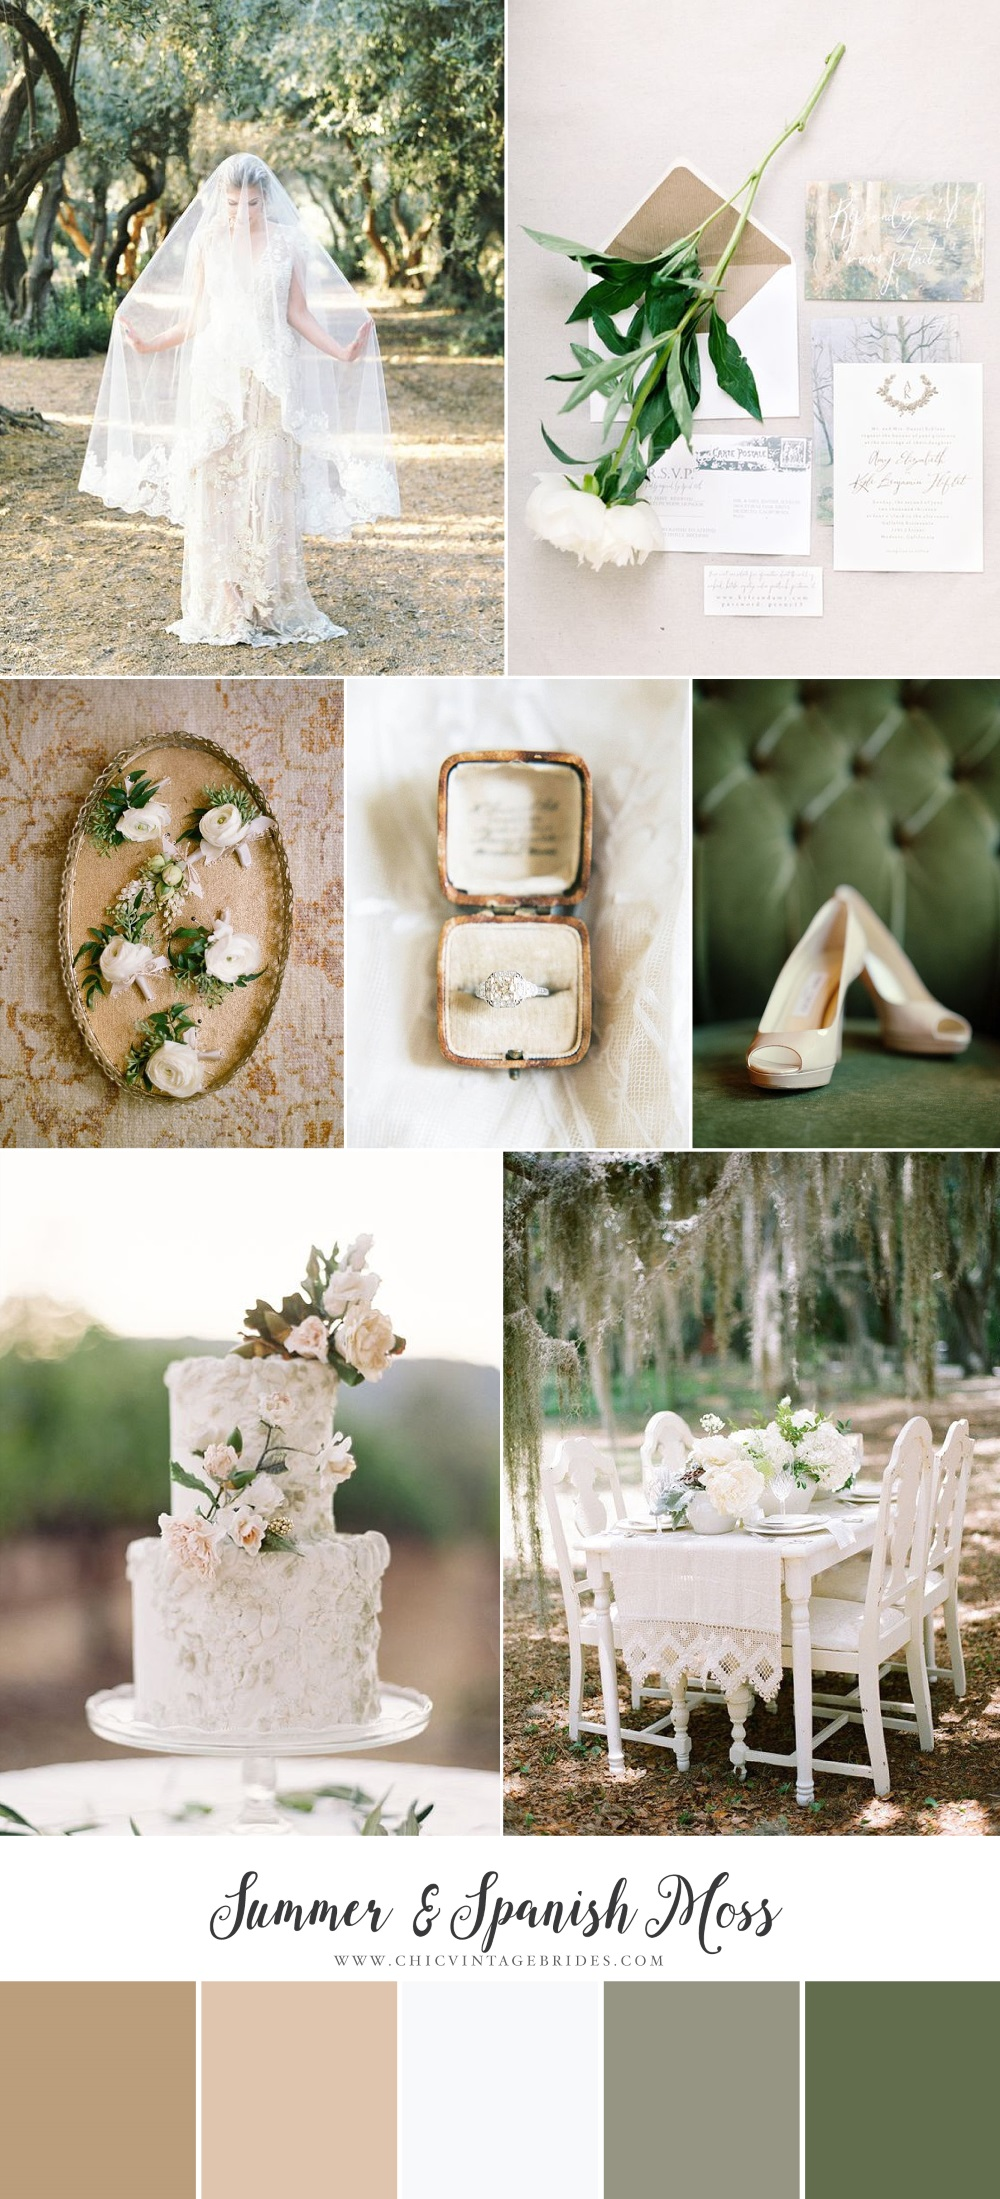 Spanish Moss Wedding Inspiration Board